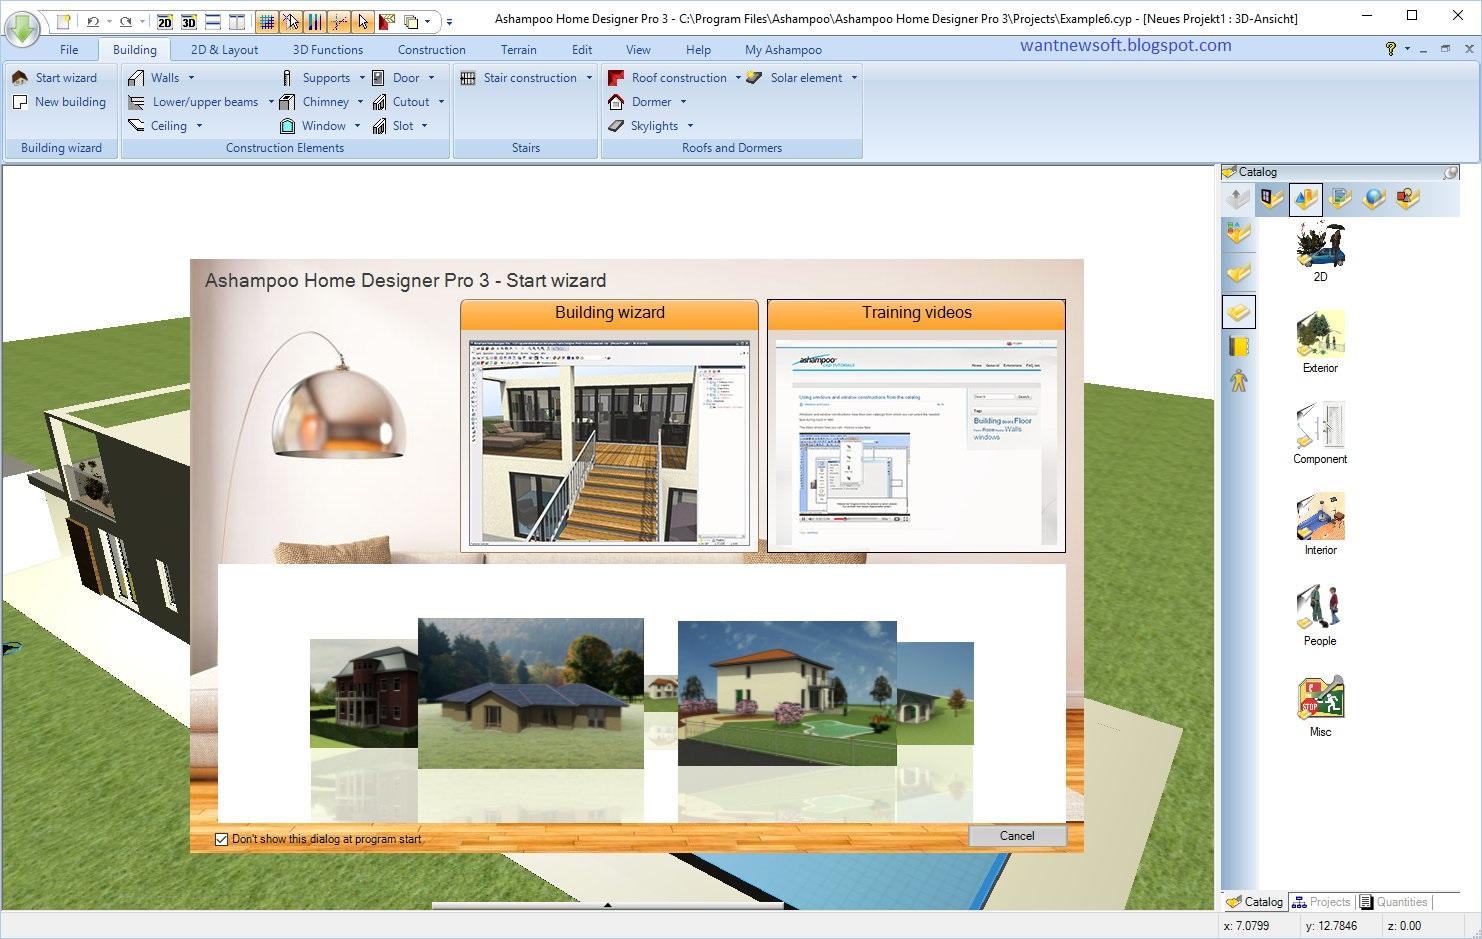 ashampoo home designer pro 4 download